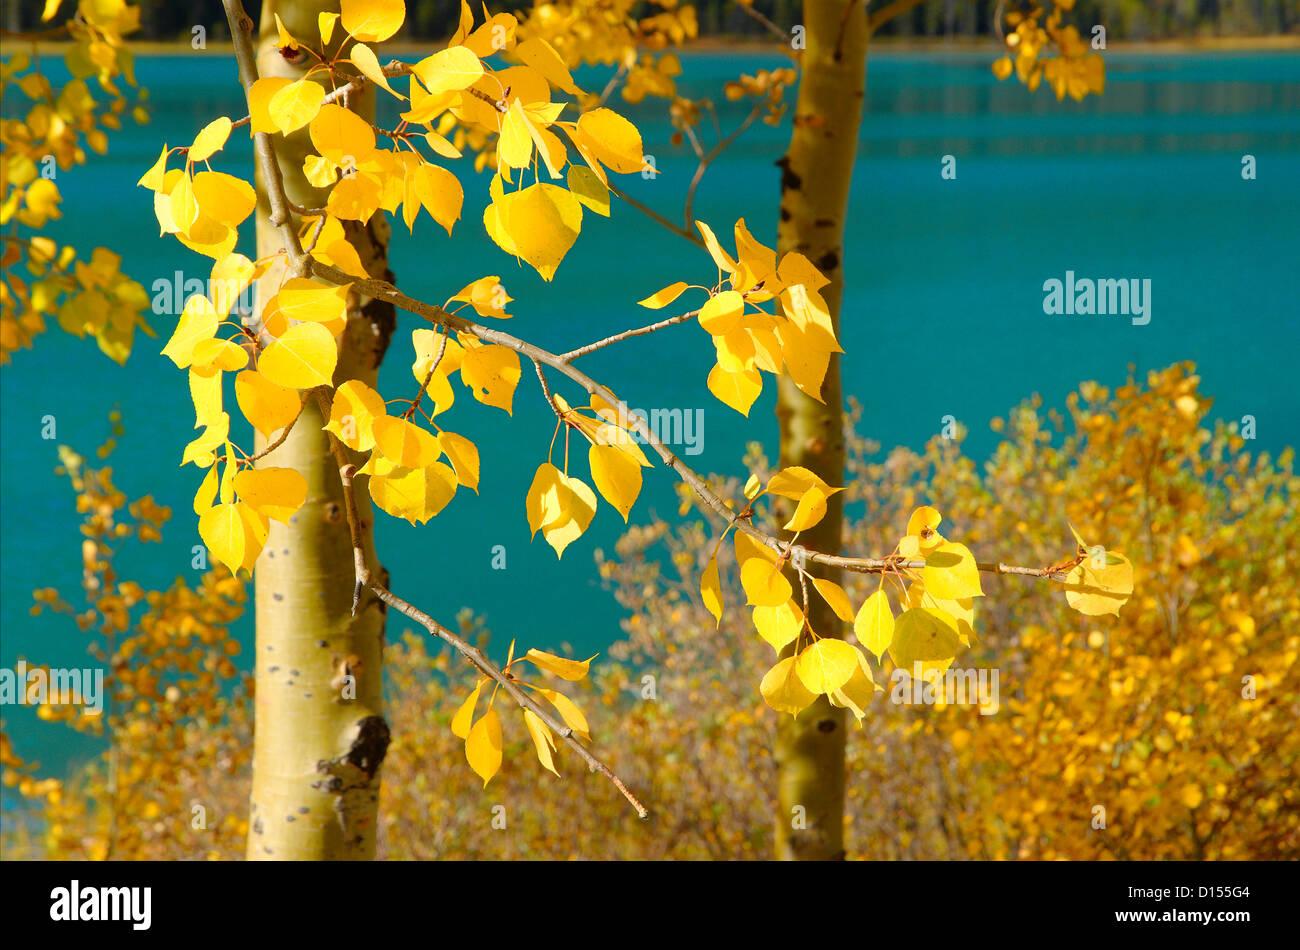 Aspen trees in Fall, Lower Waterfowl Lake, Banff National Park, Alberta, Canada - Stock Image